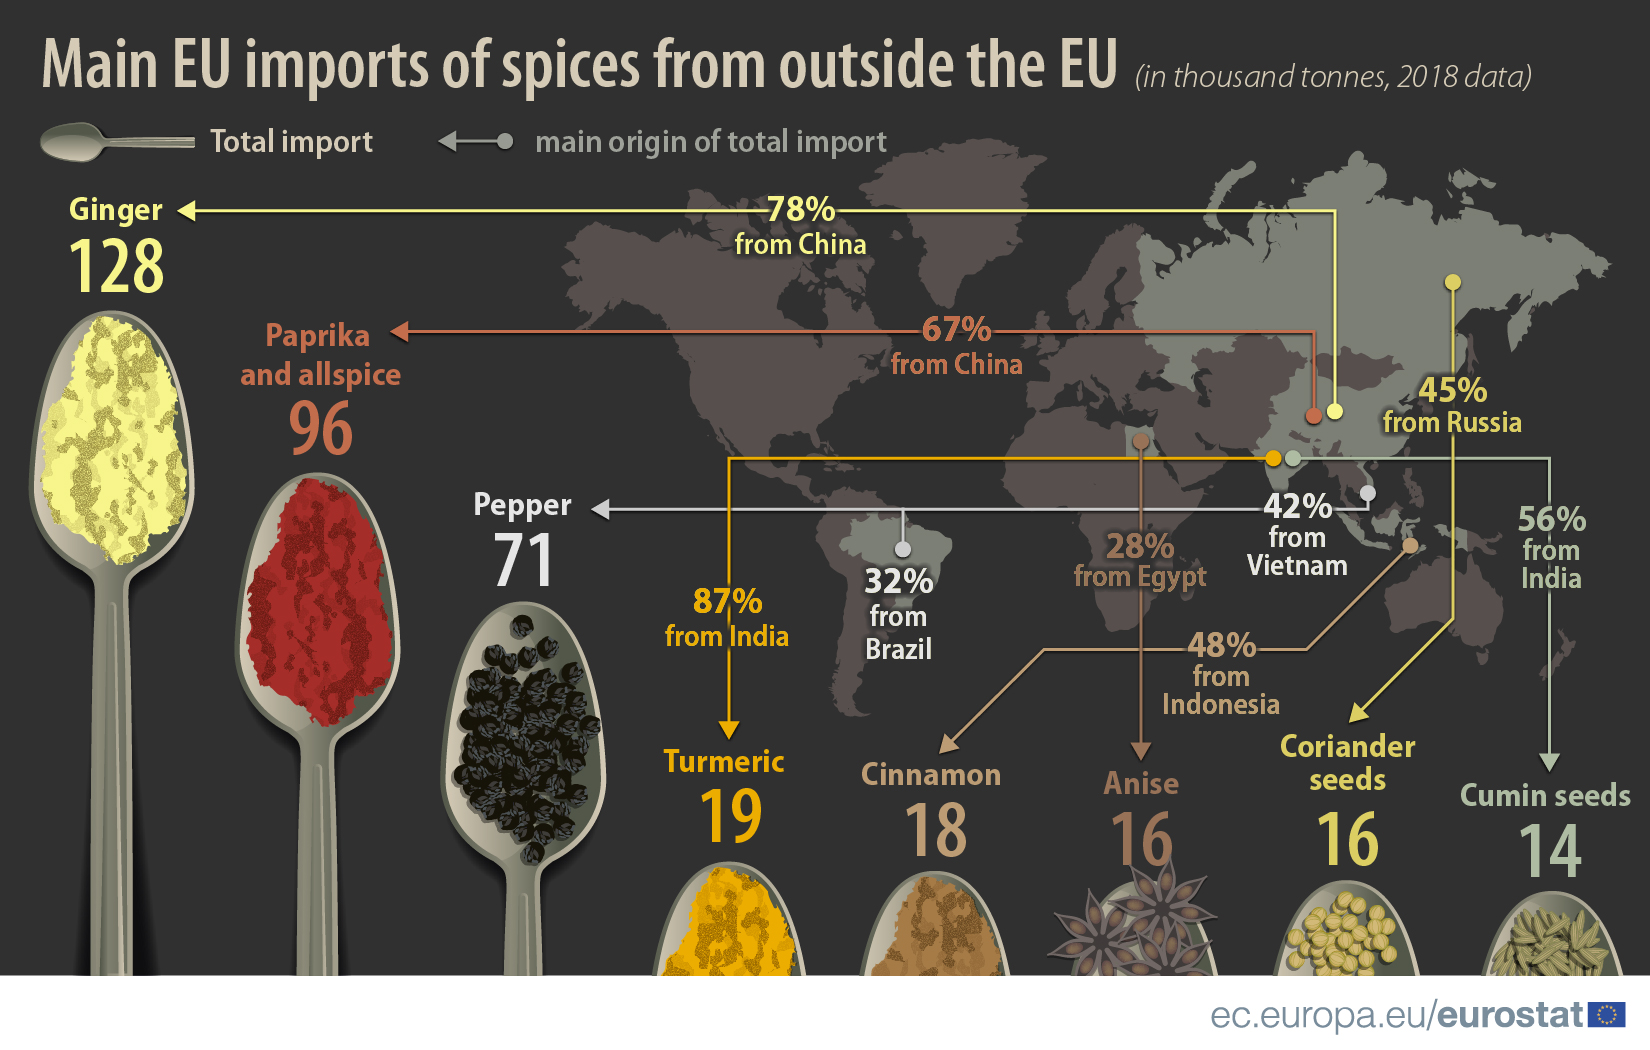 https://ec.europa.eu/eurostat/documents/4187653/9451024/Trade+in+spices/91a3fe62-425f-f68d-5058-6dfd18fbcbac?t=1576745031975